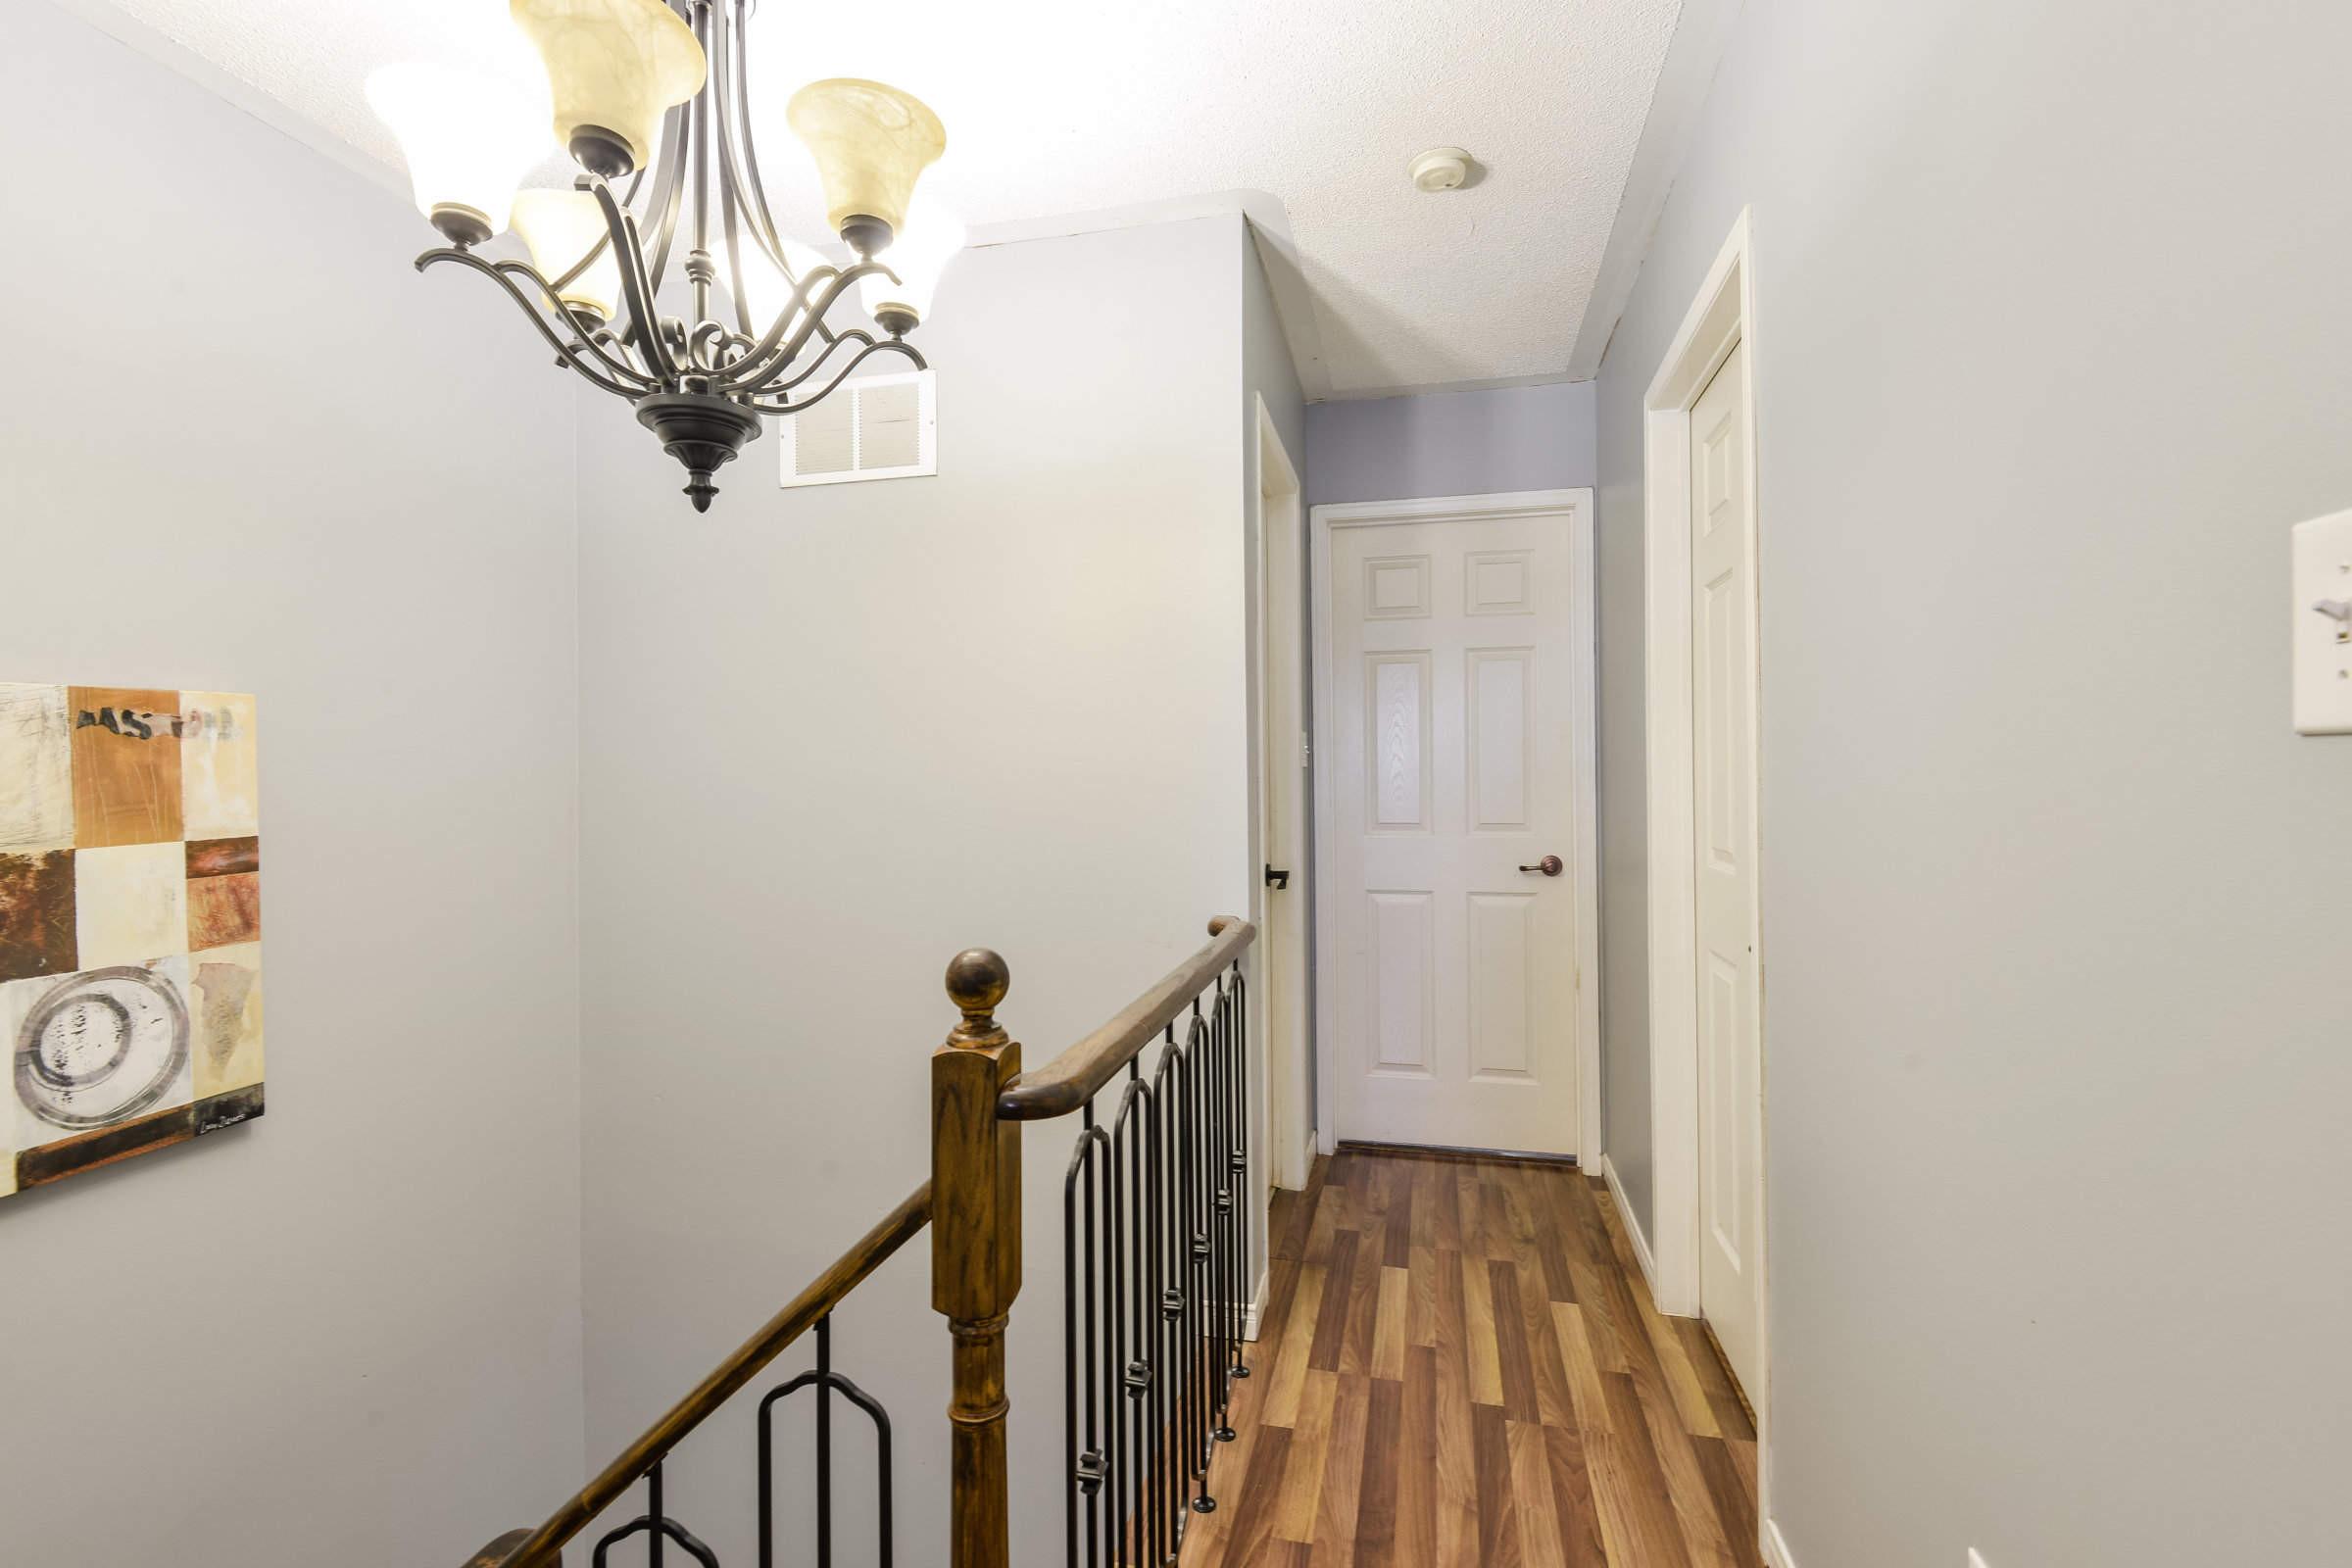 Hardwood Flooring Installation Mississauga Of 7258 Frontier Ridge Mississauga by asha Singh with 533340